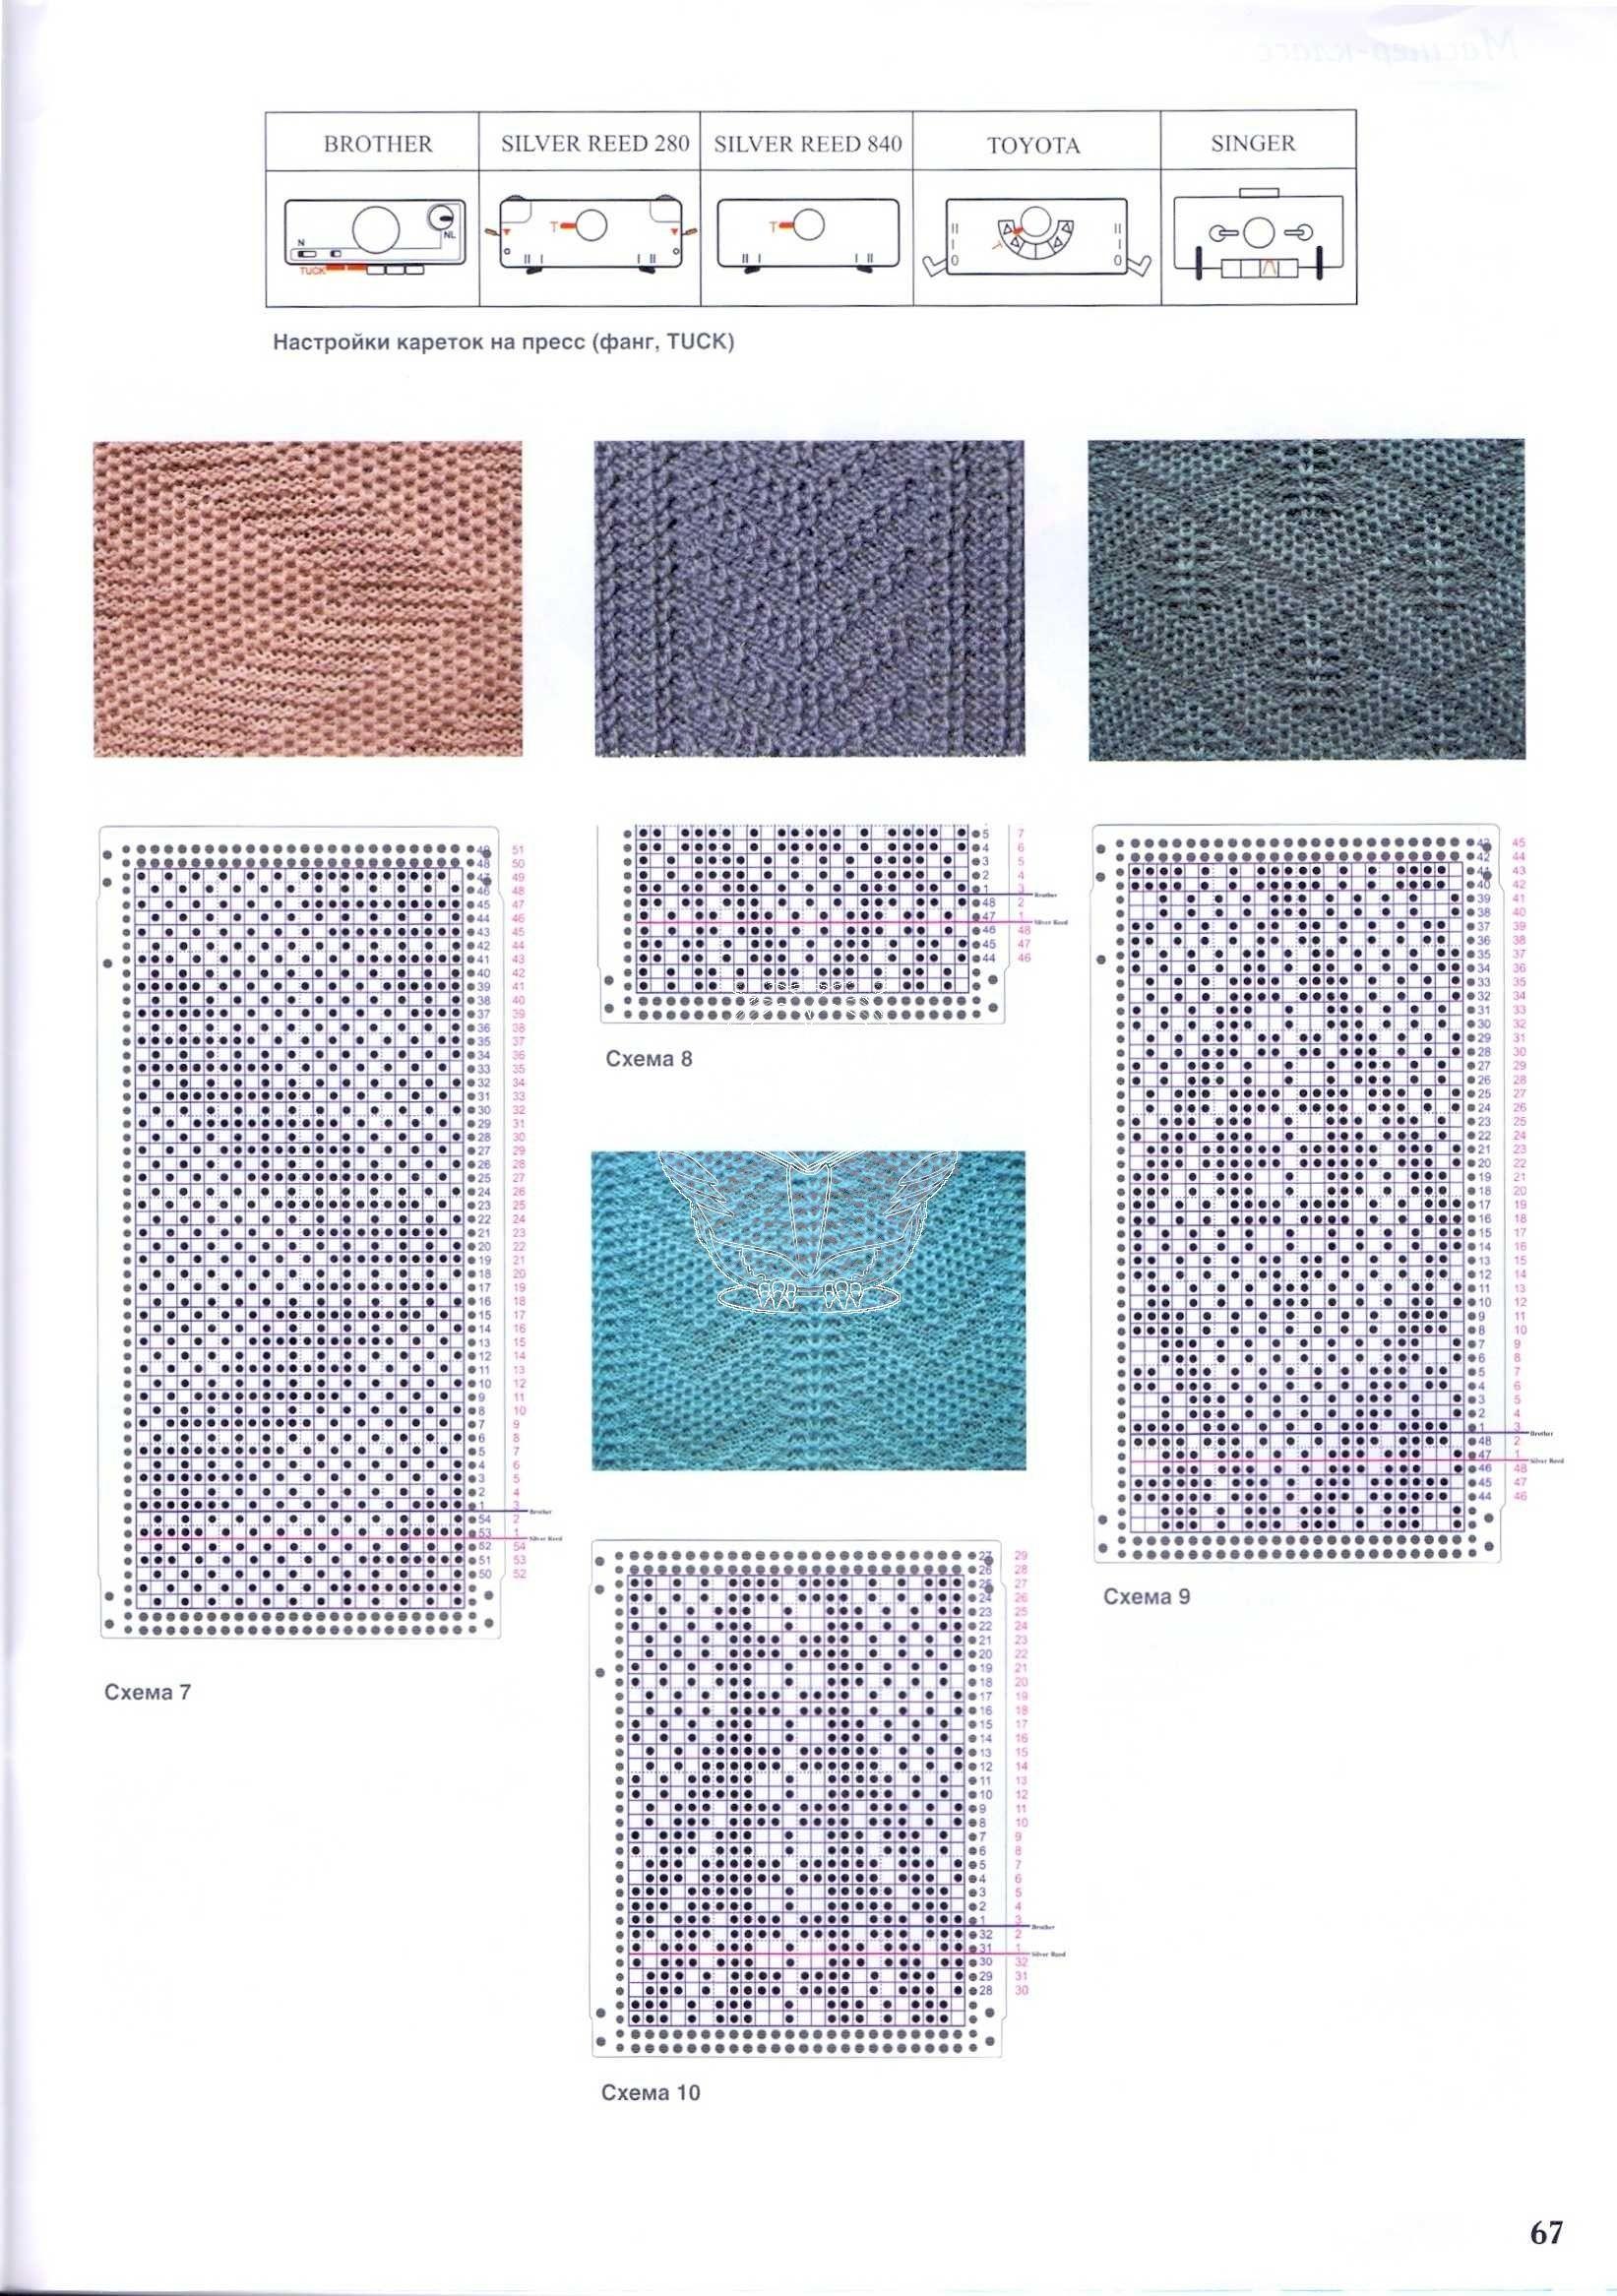 Link to machine knitting punchcard tuck stick patterns | Vintage ...